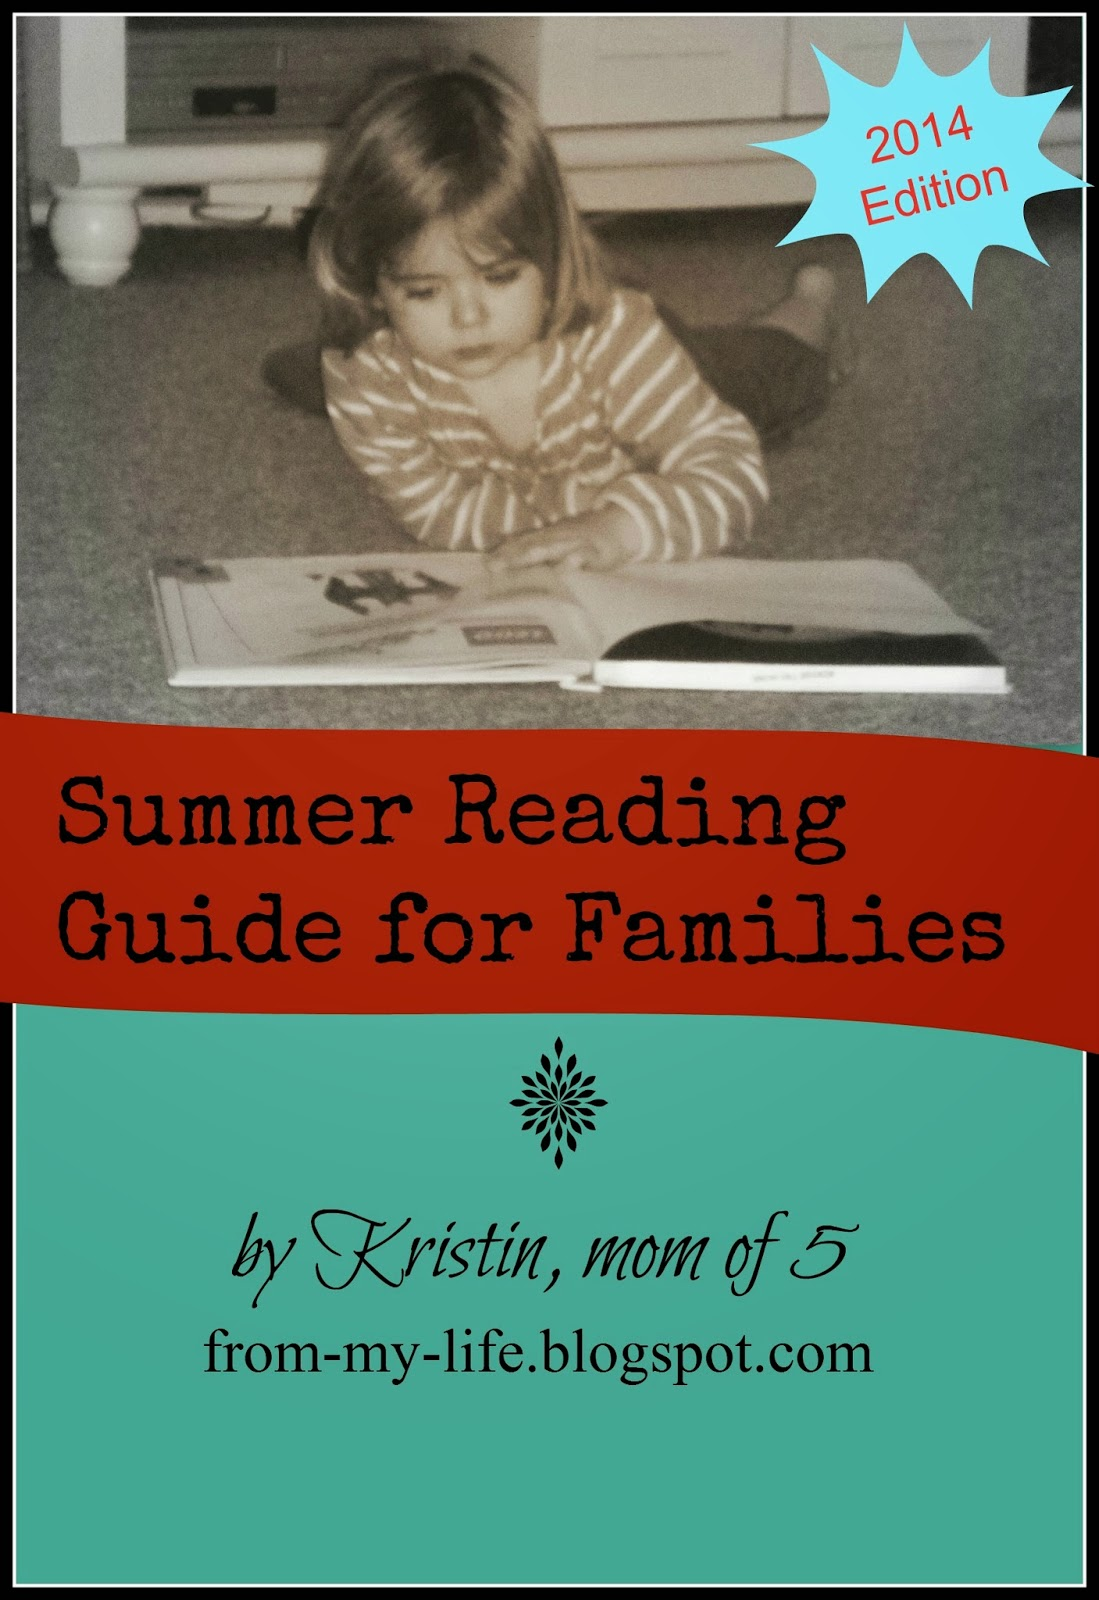 http://bitsandpiecesfrommylife.files.wordpress.com/2014/05/summer-read-aloud-guide-20141.pdf